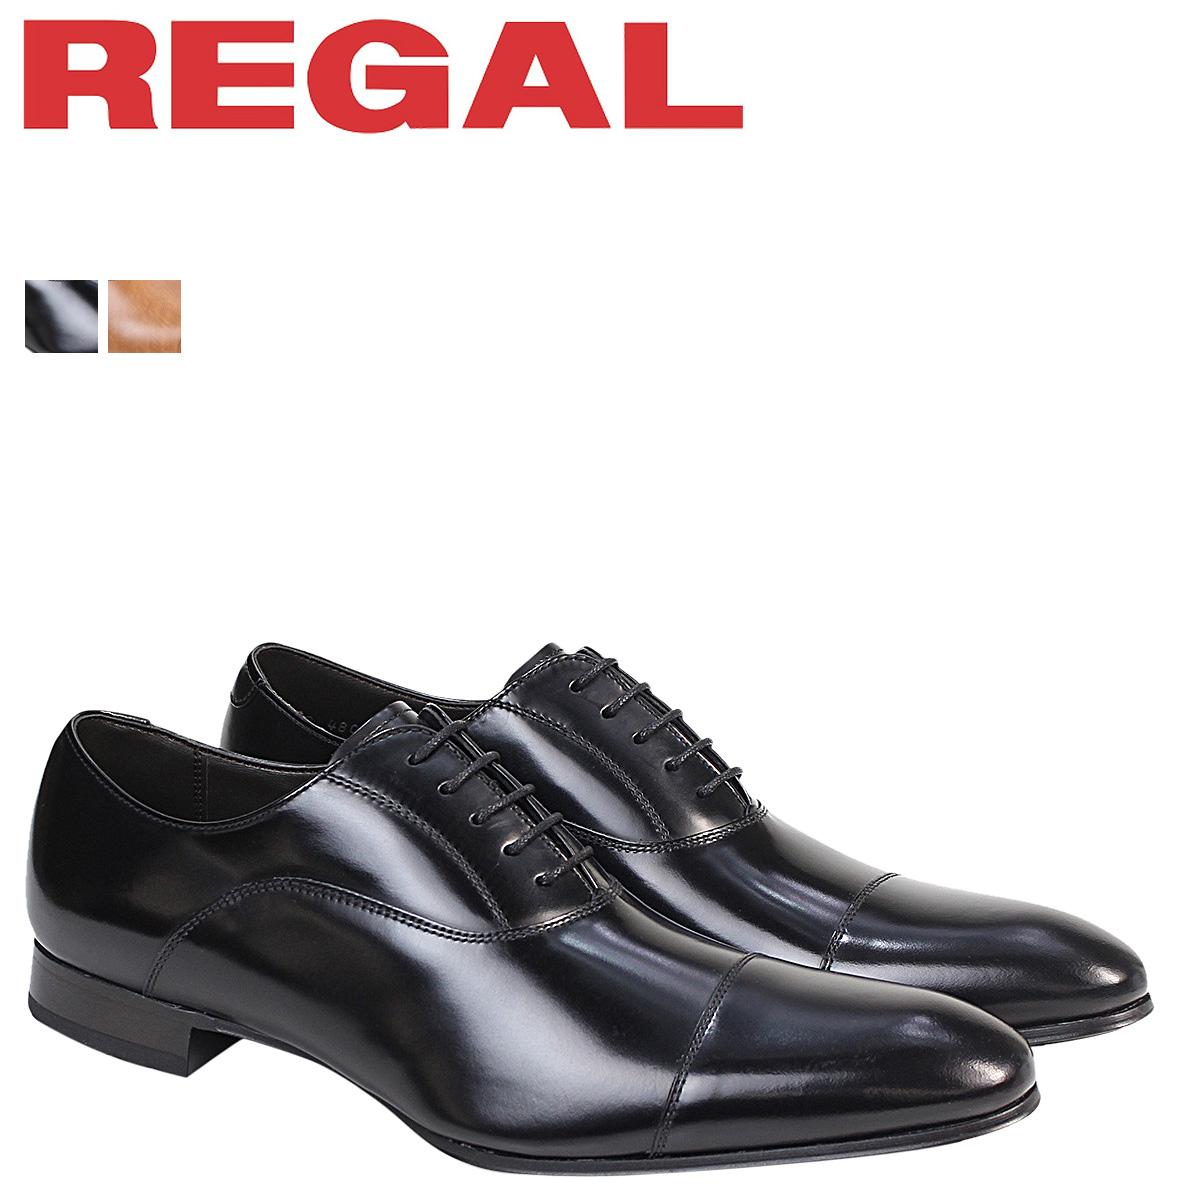 REGAL 靴 メンズ リーガル ストレートチップ 011RAL ビジネスシューズ 防水 [4/3 追加入荷]